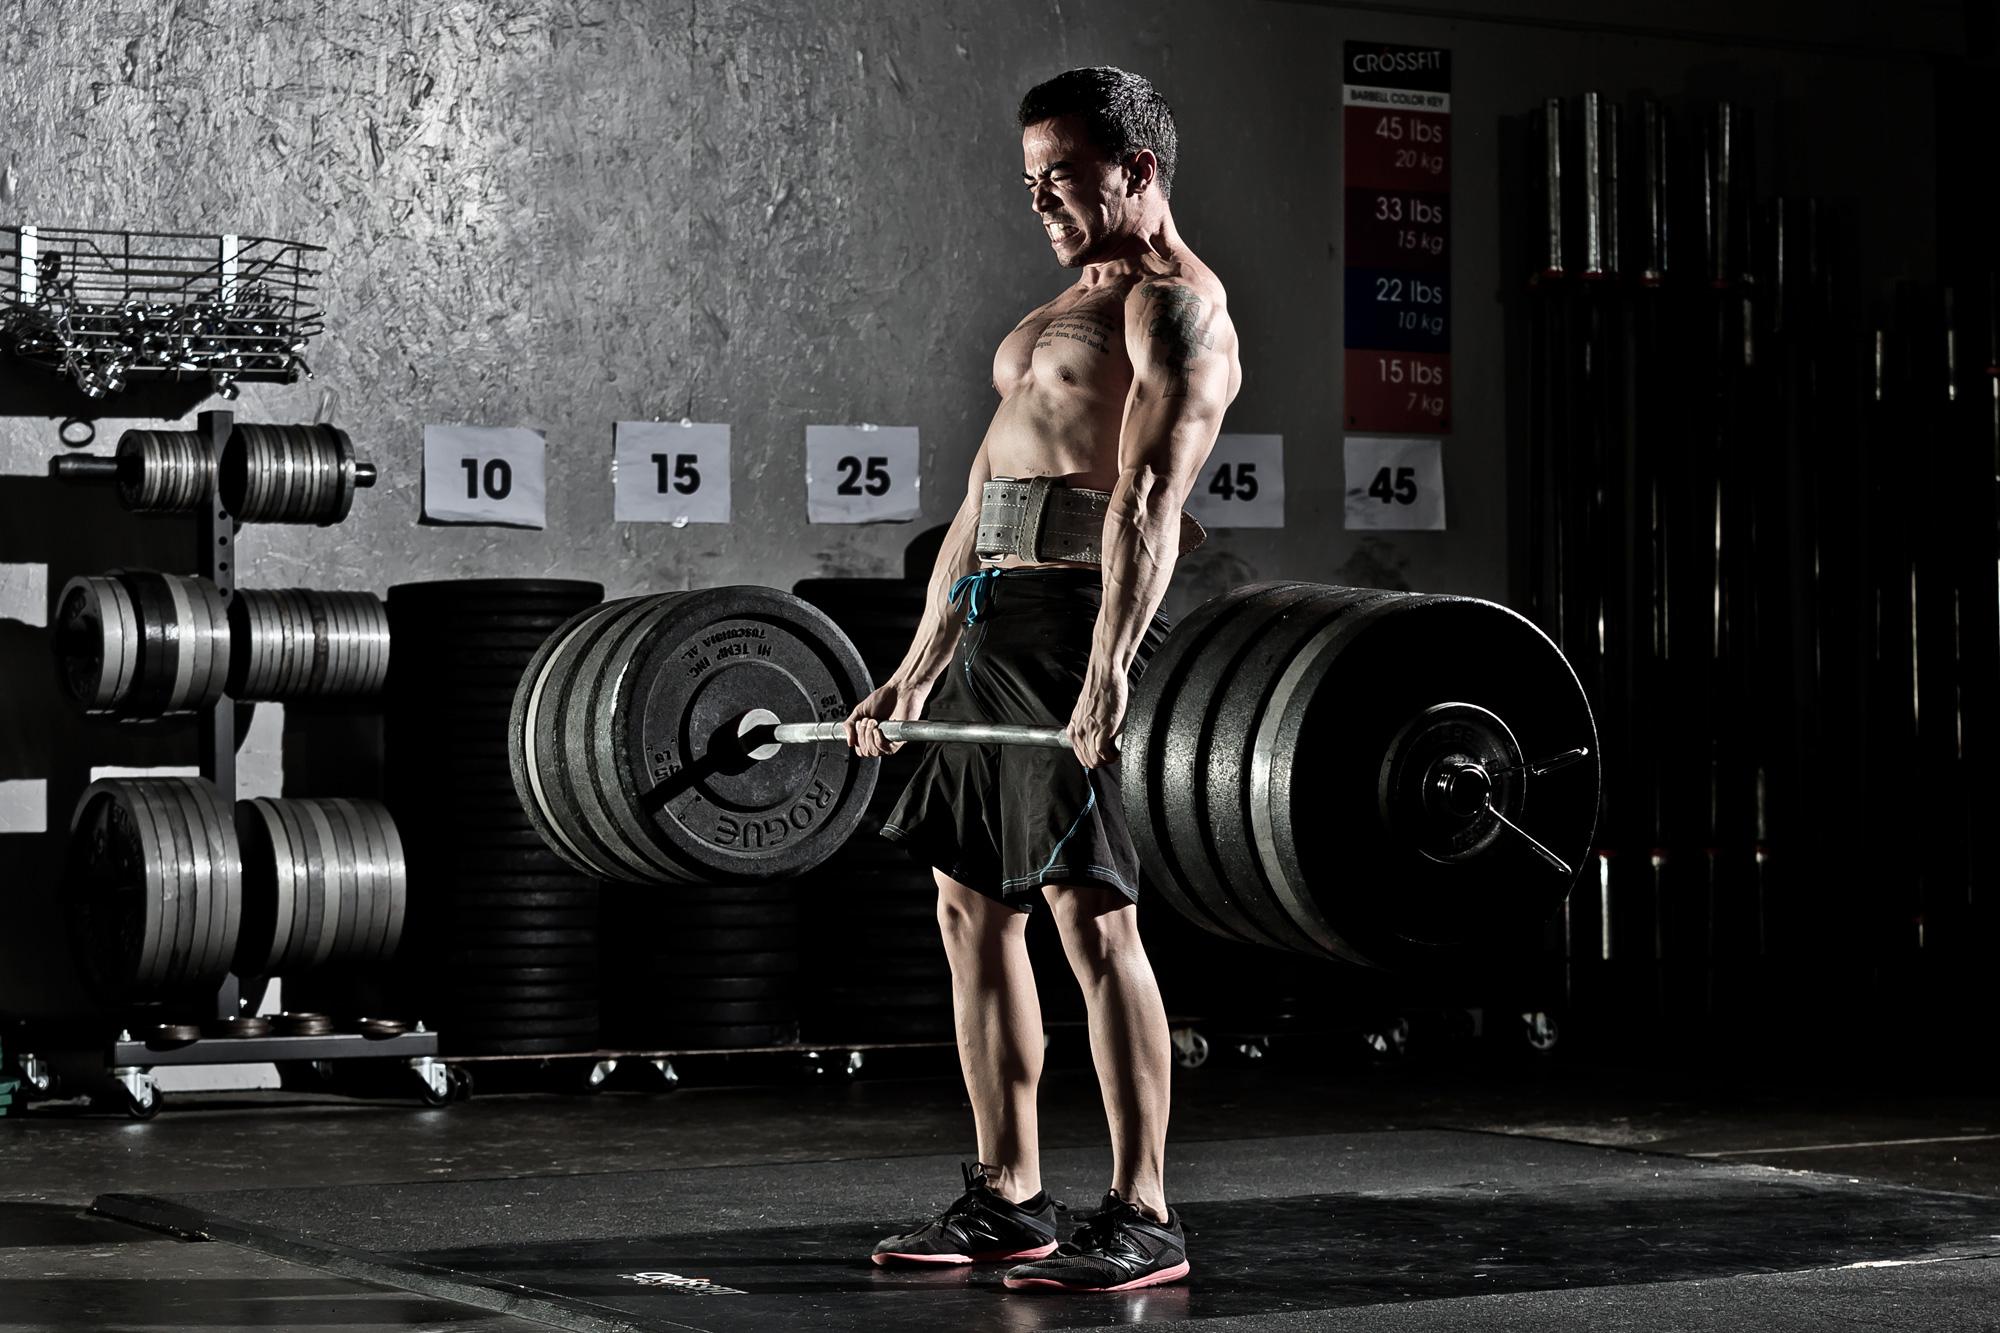 Dan Raabe, adult, fitness, training, interval, running, strength, cross-fit, performance, resistance, calisthenics, pliometircs, gymnastics, metabolic